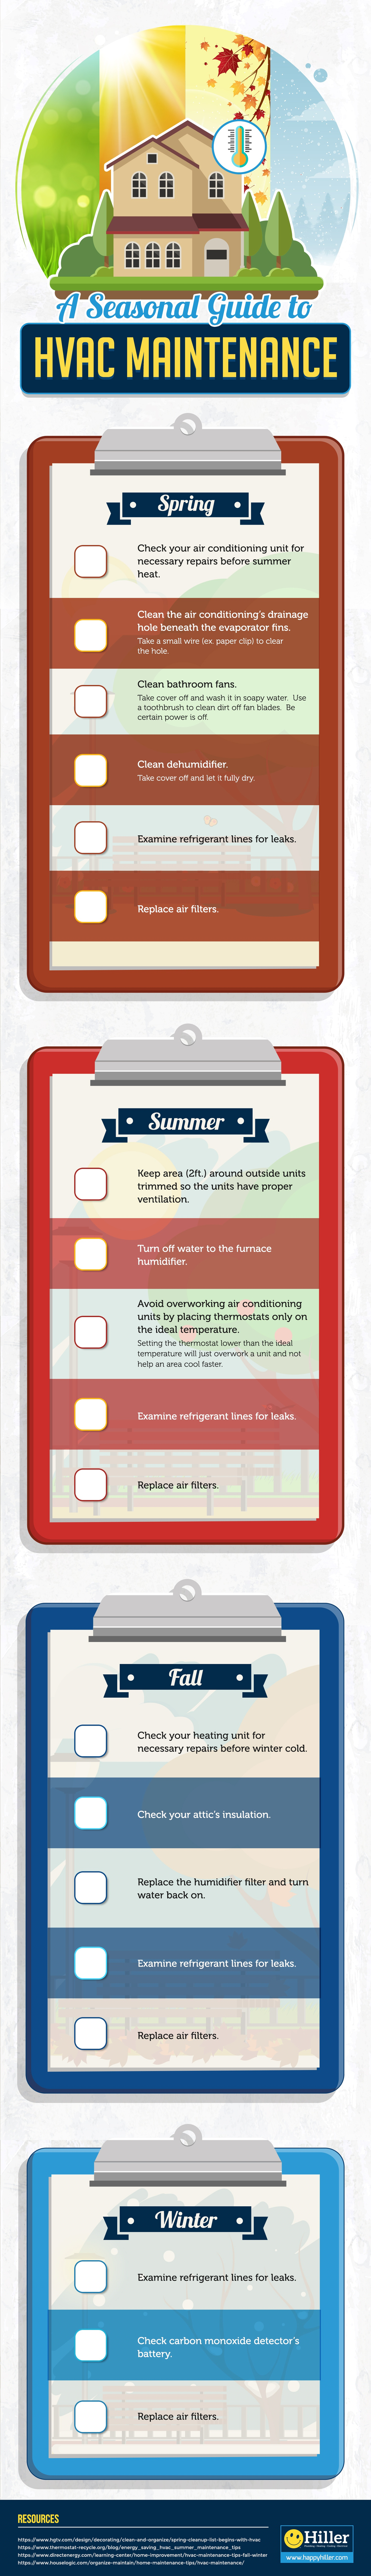 A_Seasonal_Guide_to_HVAC_Maintenance_V_2 (2)